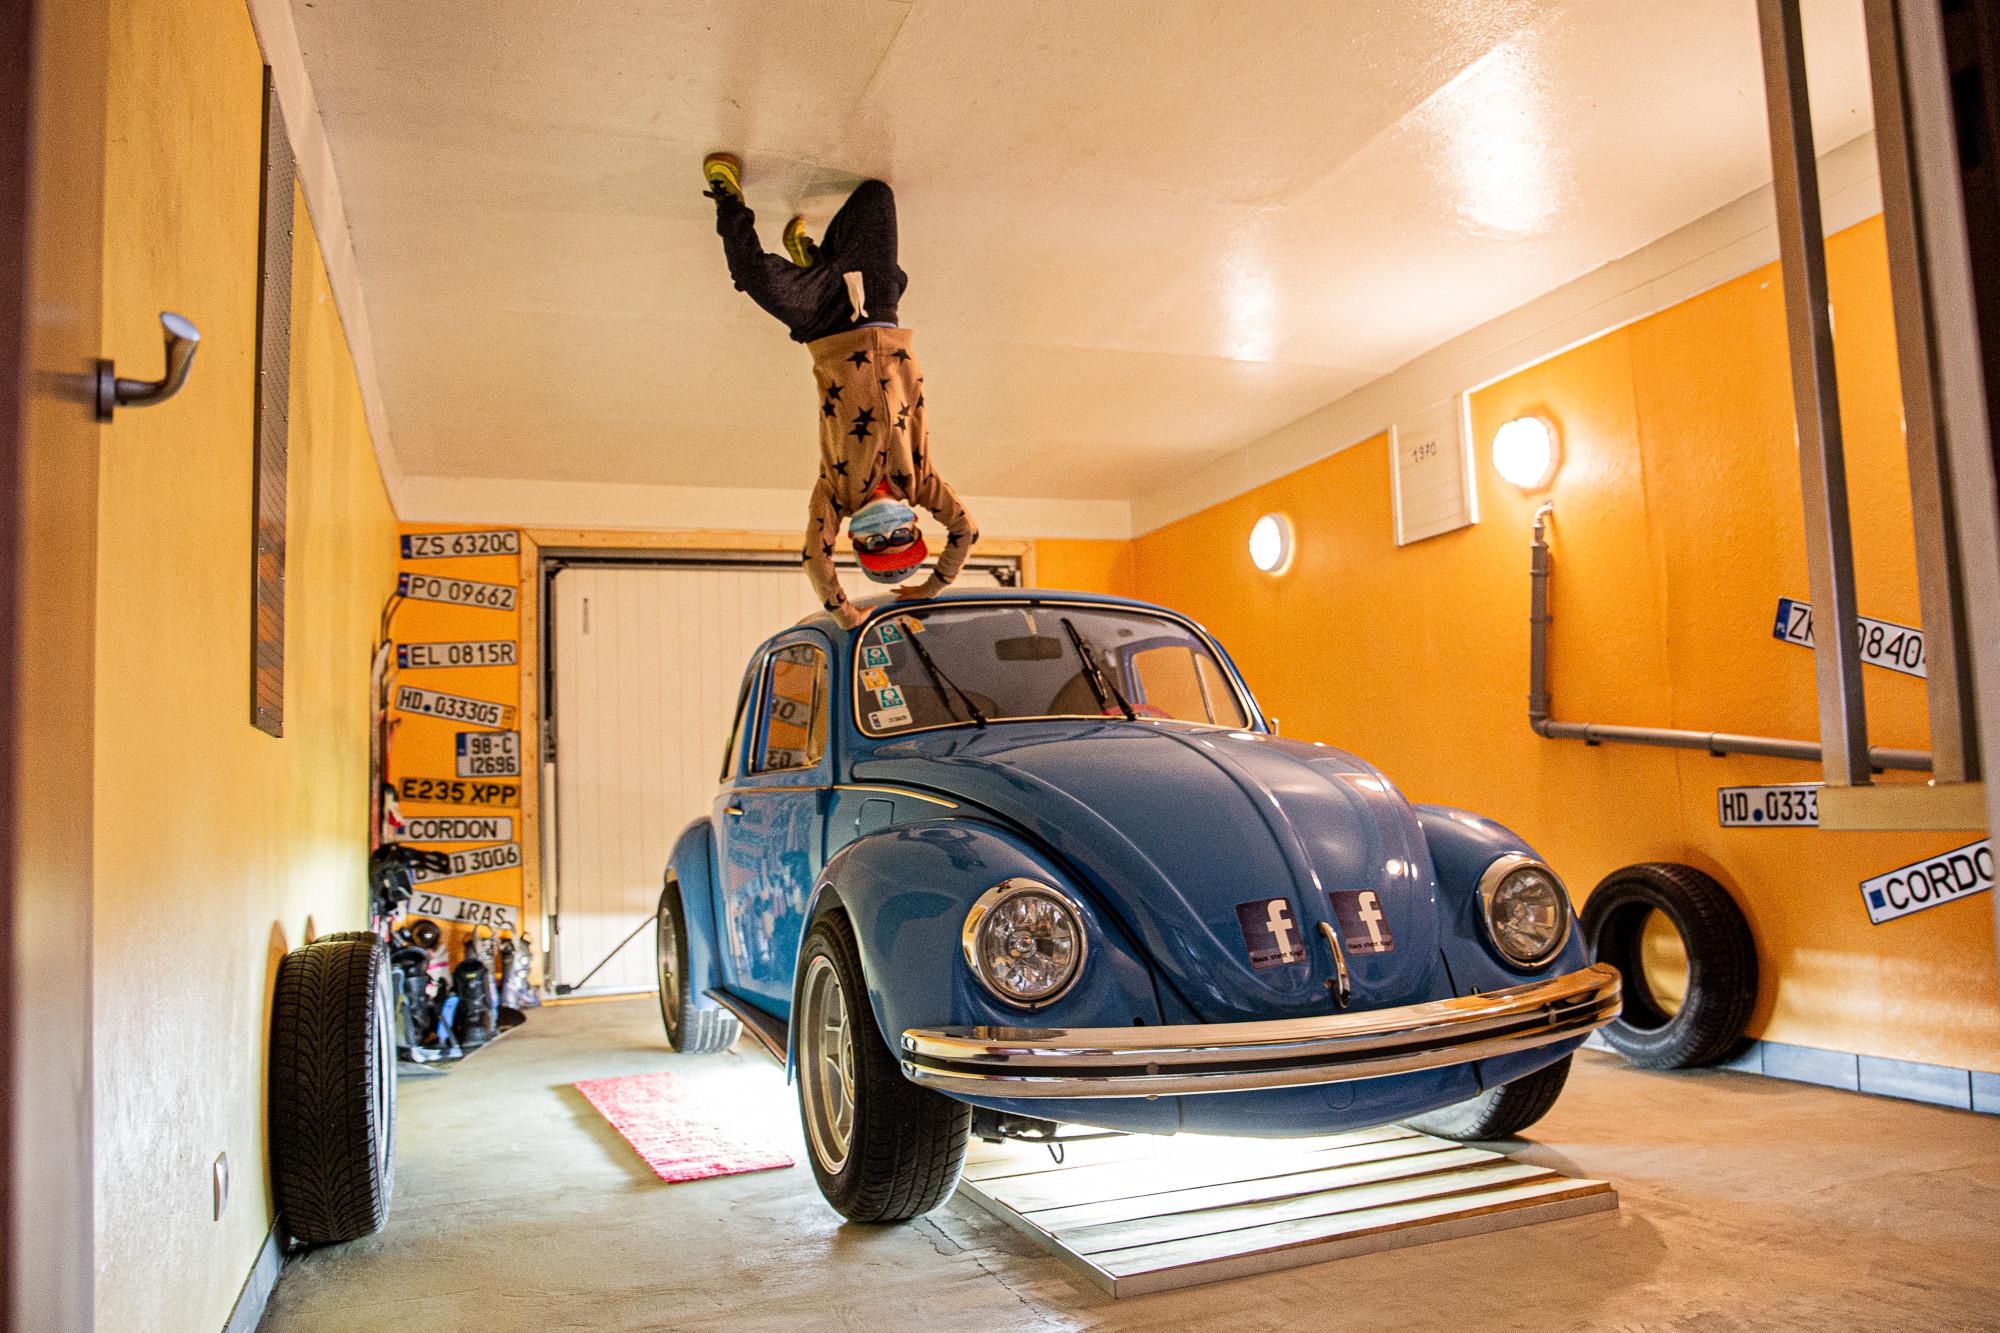 Haus steht Kopf | Vomp | Terfens | Ausflugsziel Tirol | Garage